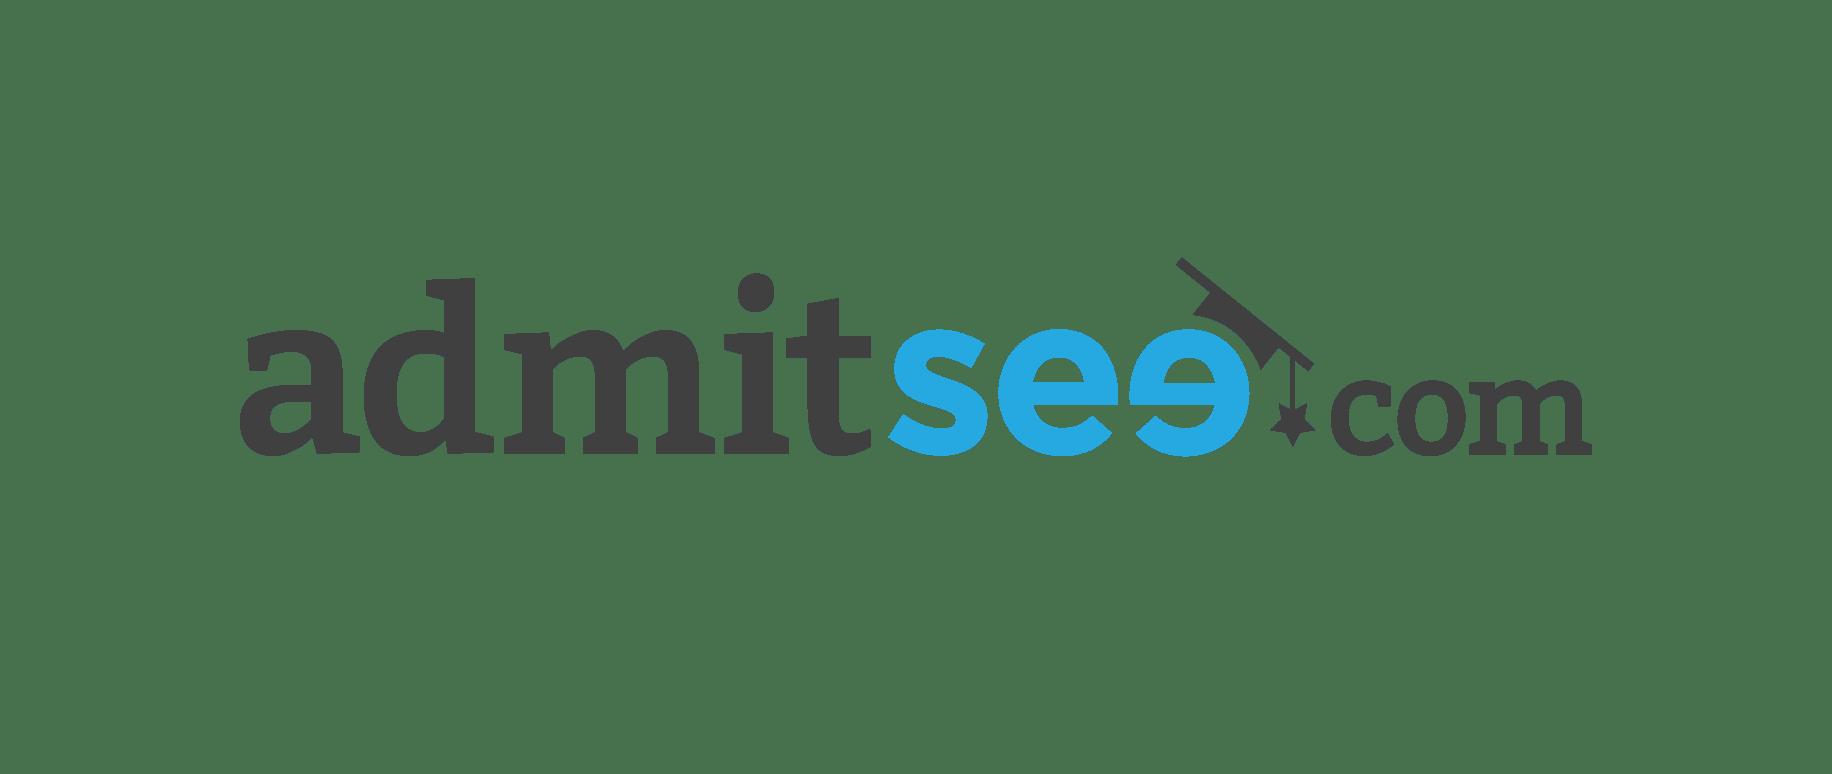 AdmitSee.com_Logo